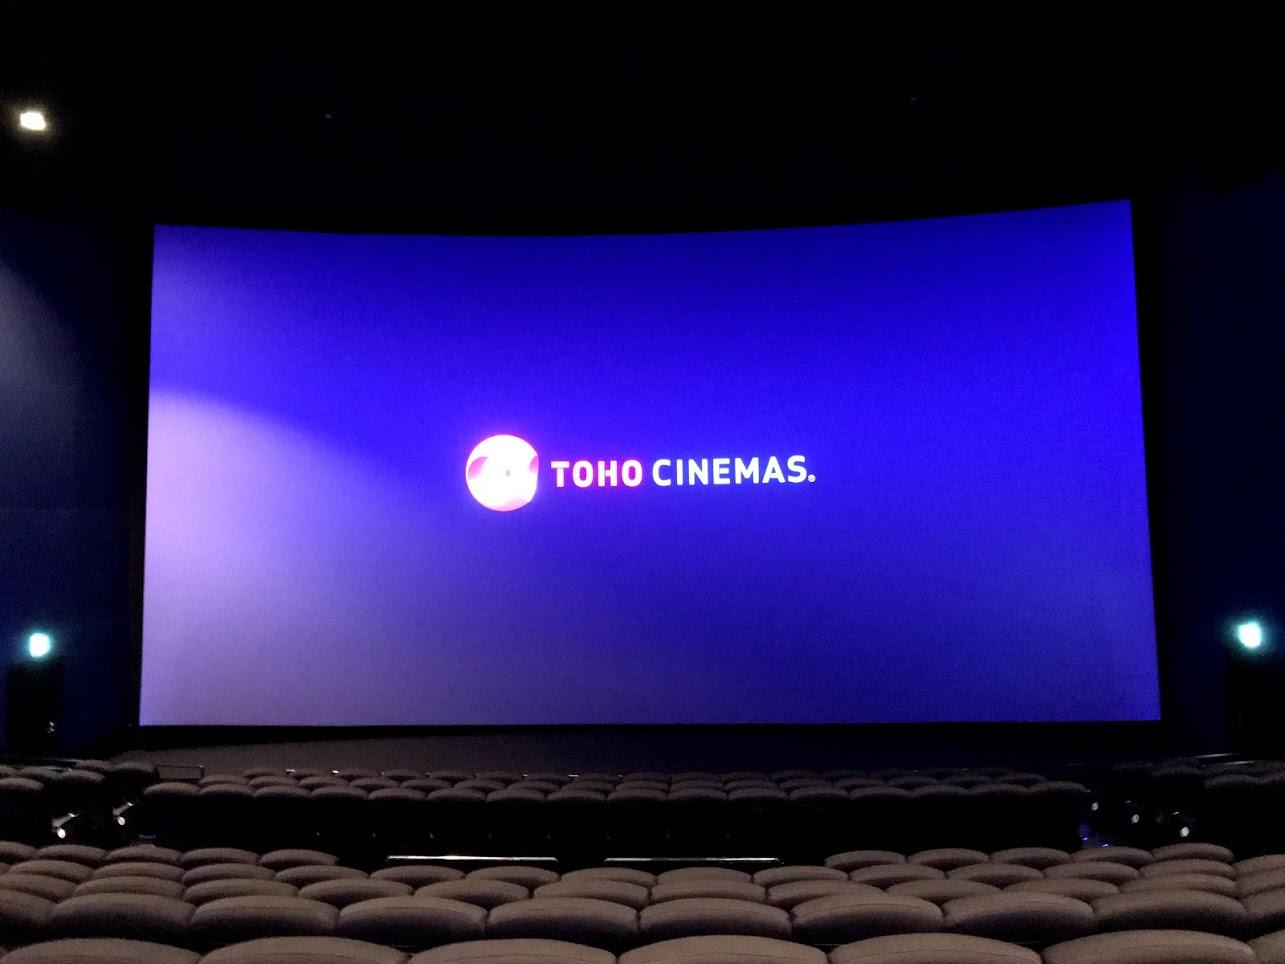 TOHO(トーホー)シネマズ・フリーパス使用2回目、1ヶ月間映画見放題!シネマイレージサービス一部変更(2018年10月15日実施)についてもご紹介